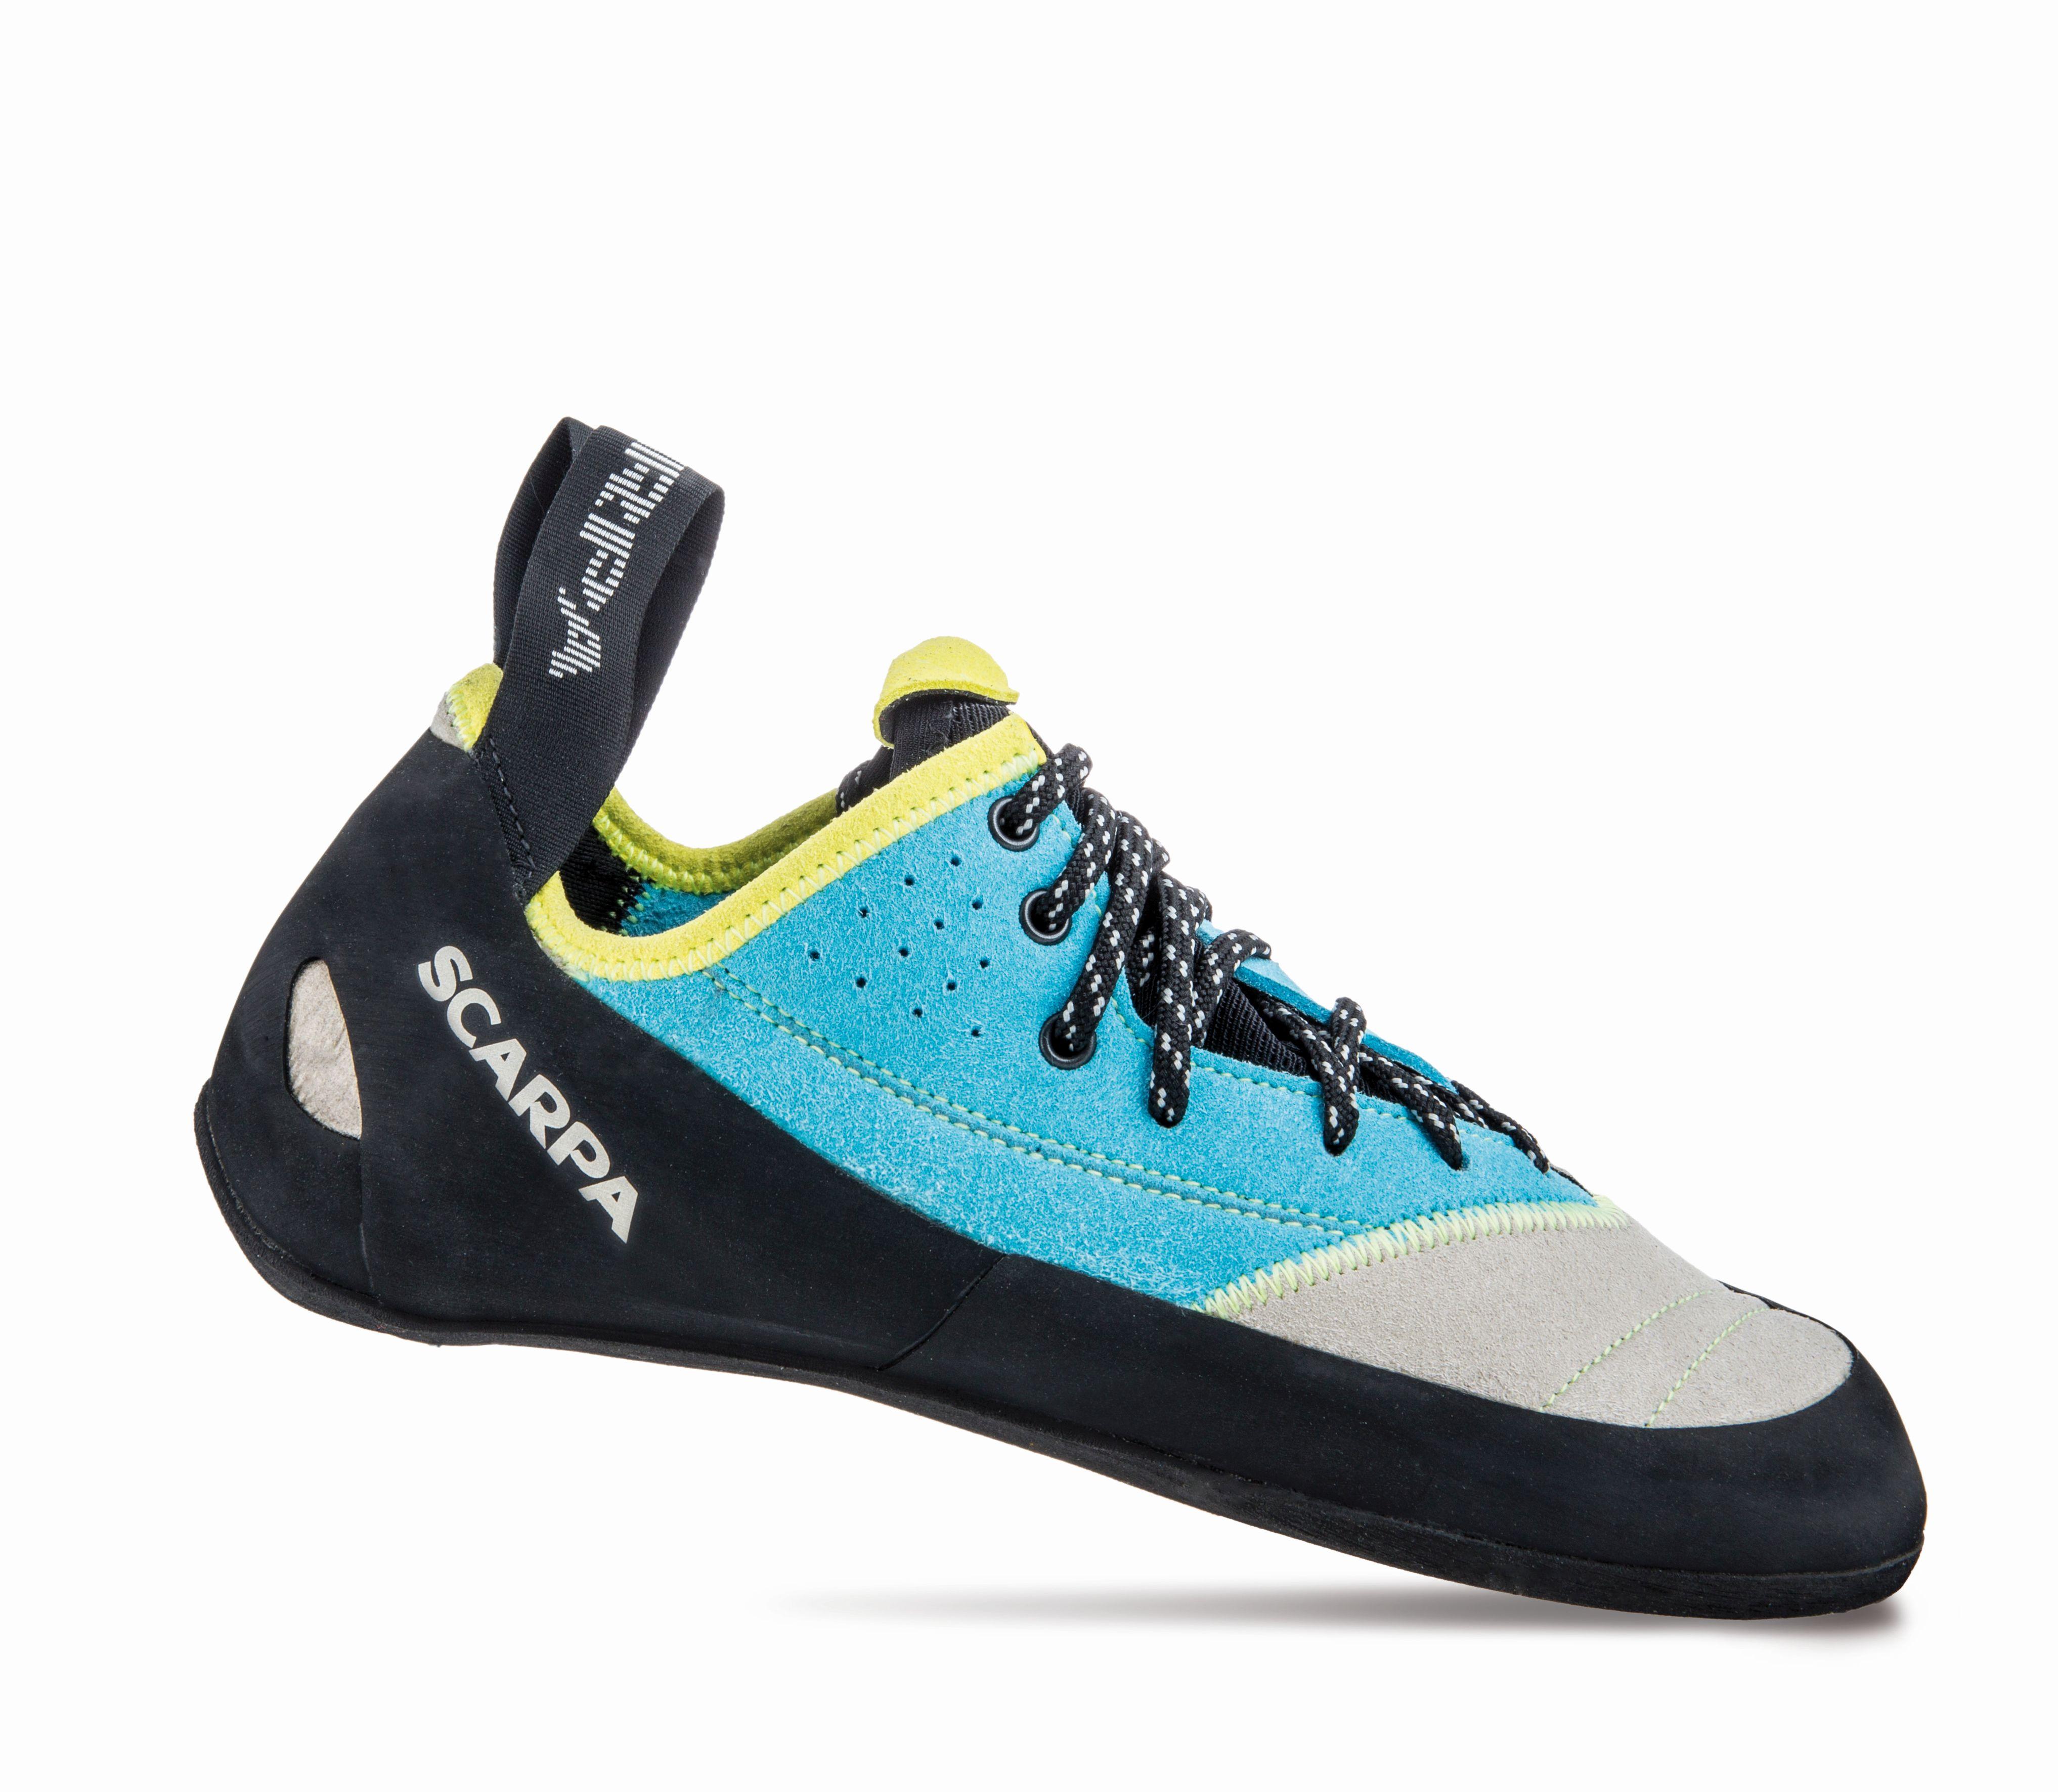 Scarpa Velocity L Wmn Lightgray/Truquoise-30